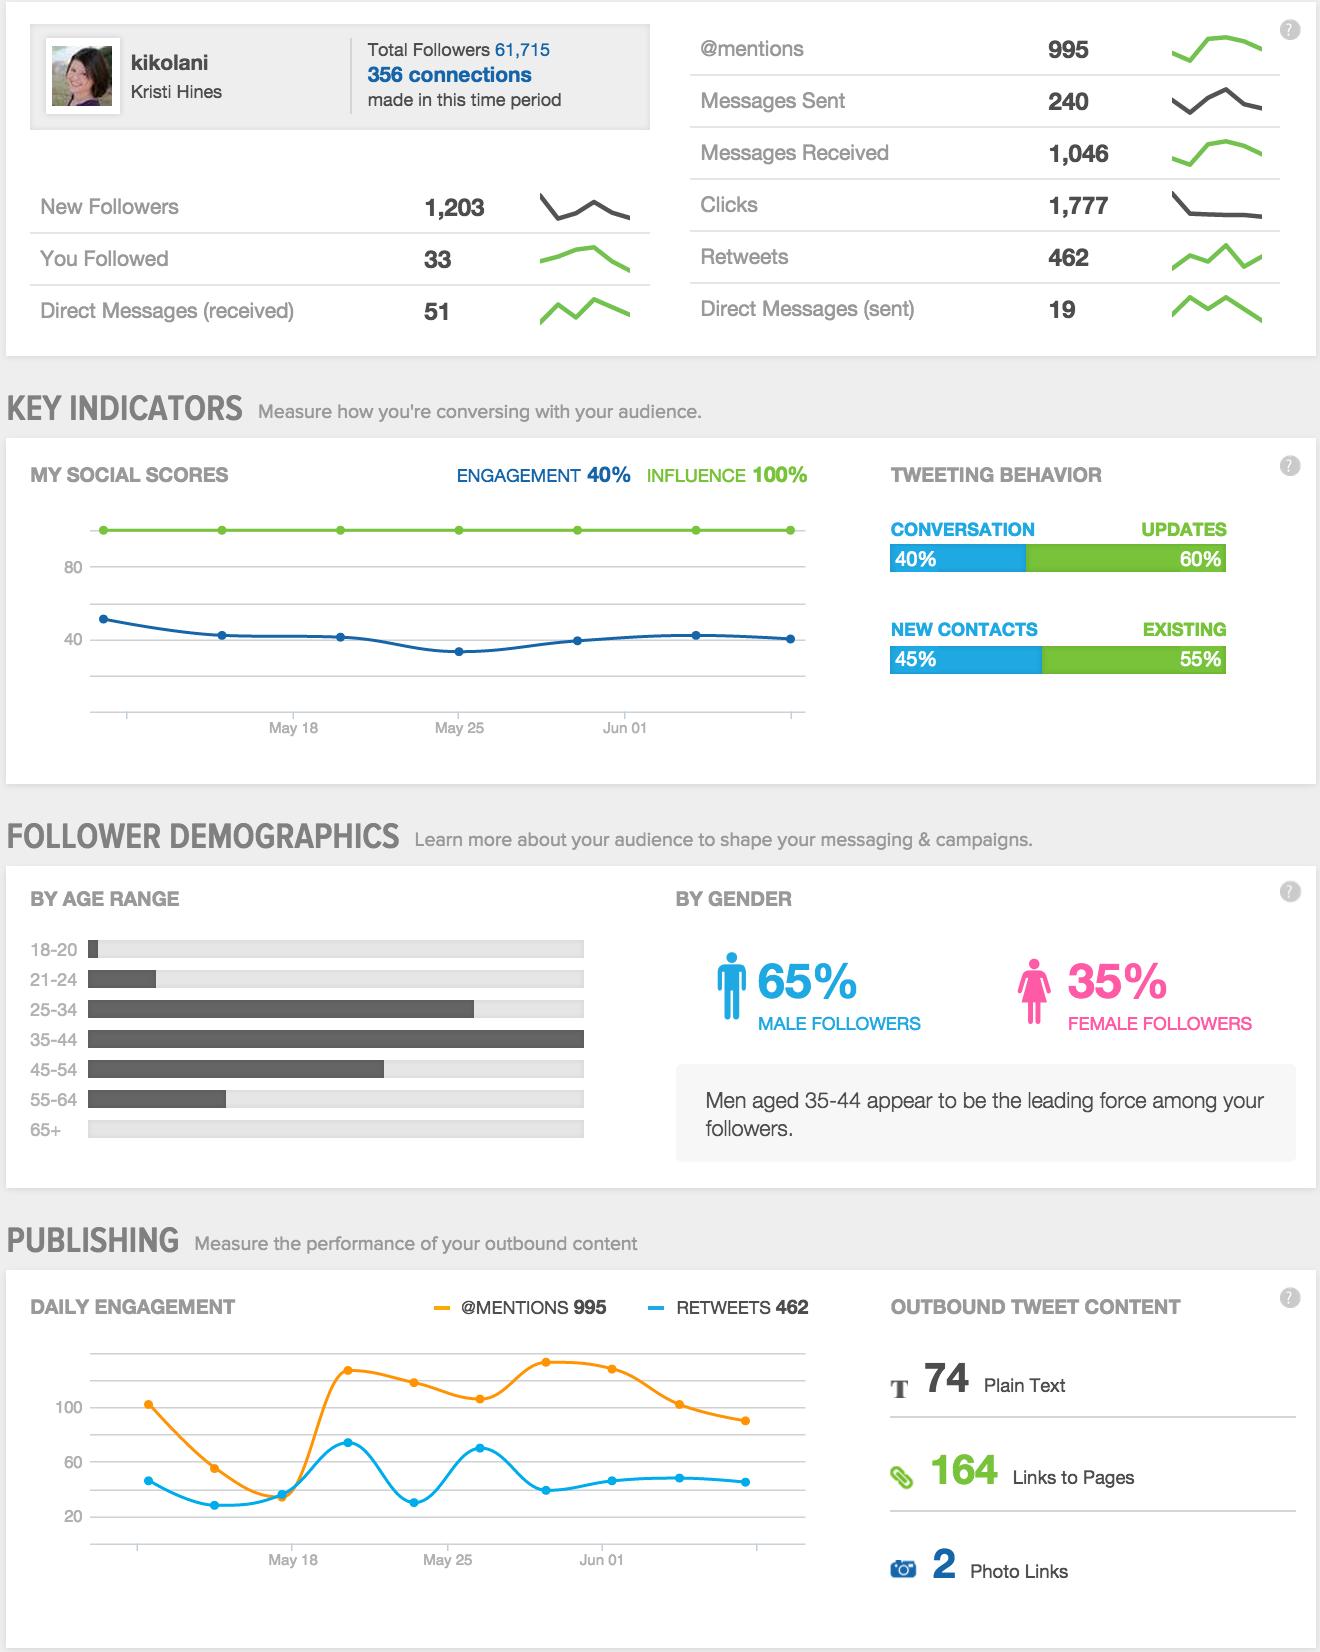 sprout social media metrics screenshot